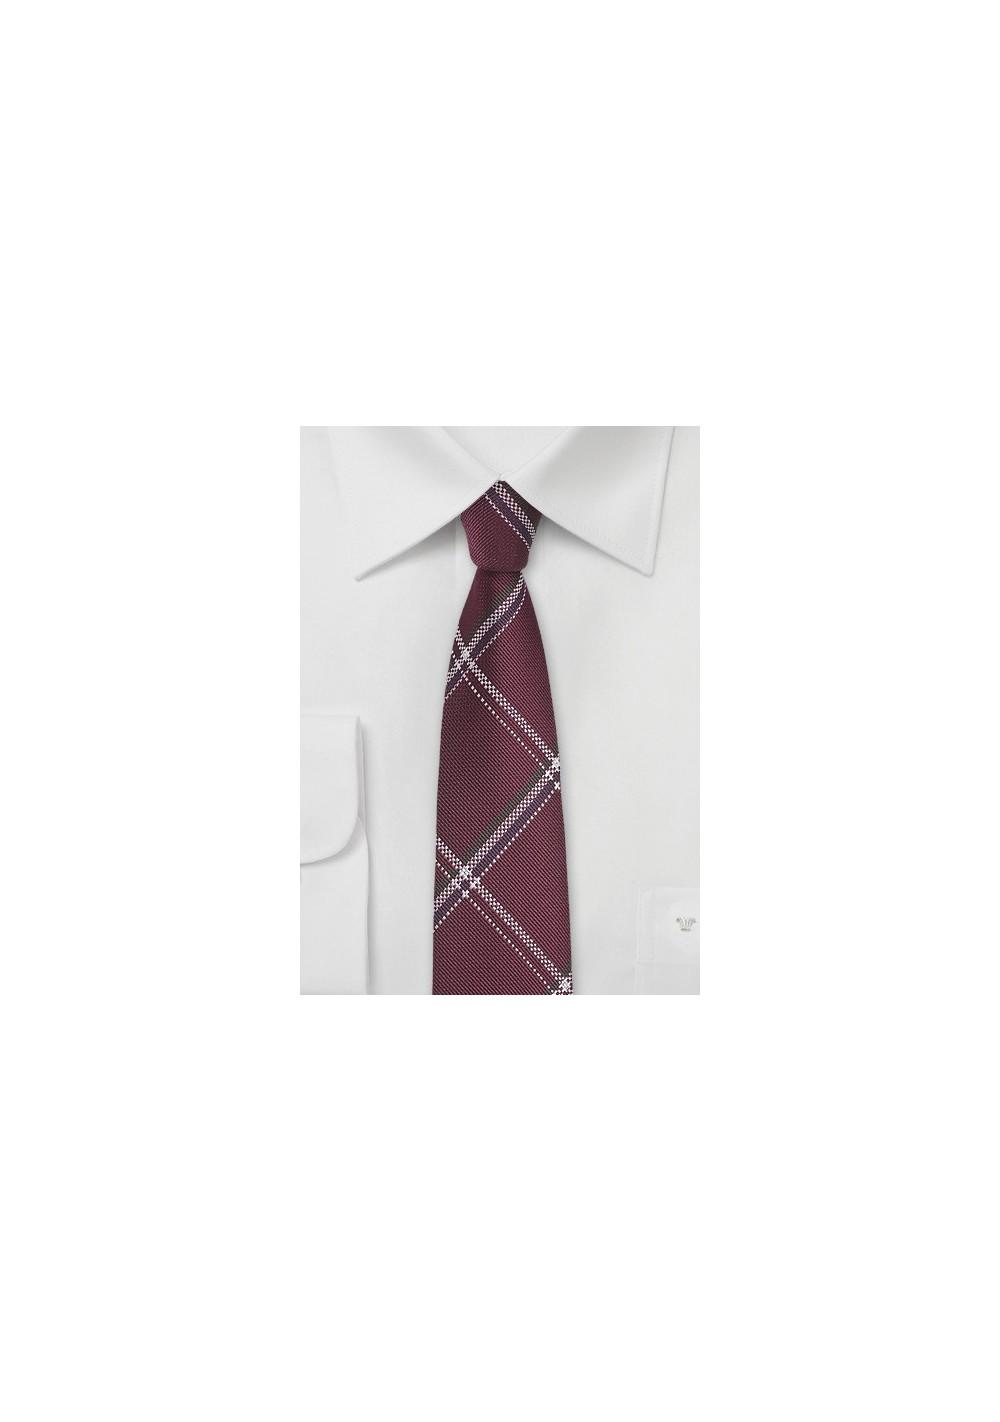 Plaid Silk Tie in Pomegranate Red